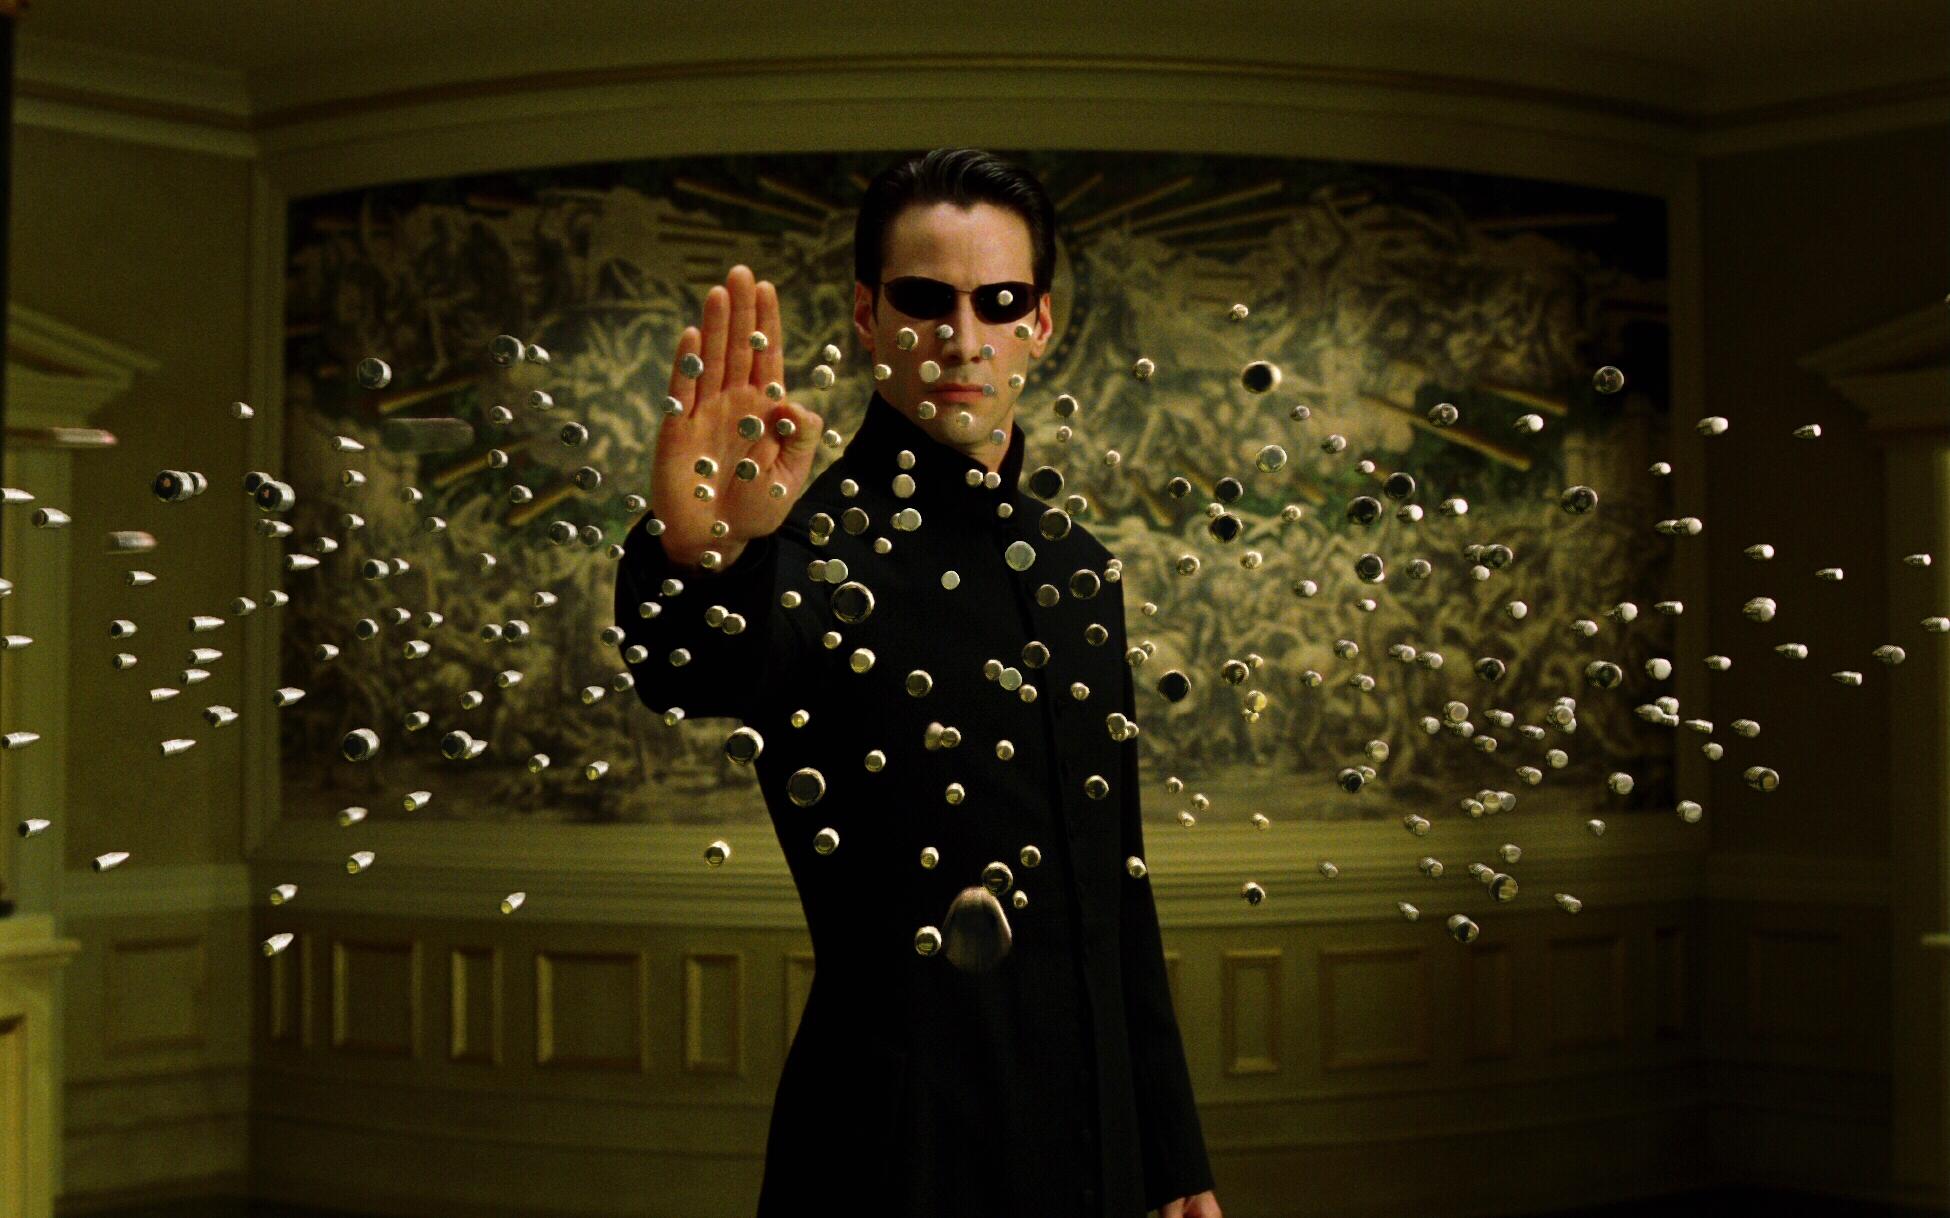 Matrix tendrá cuarta parte con Keanu Reeves, Carrie-Ann Moss y Lilly Wachowski